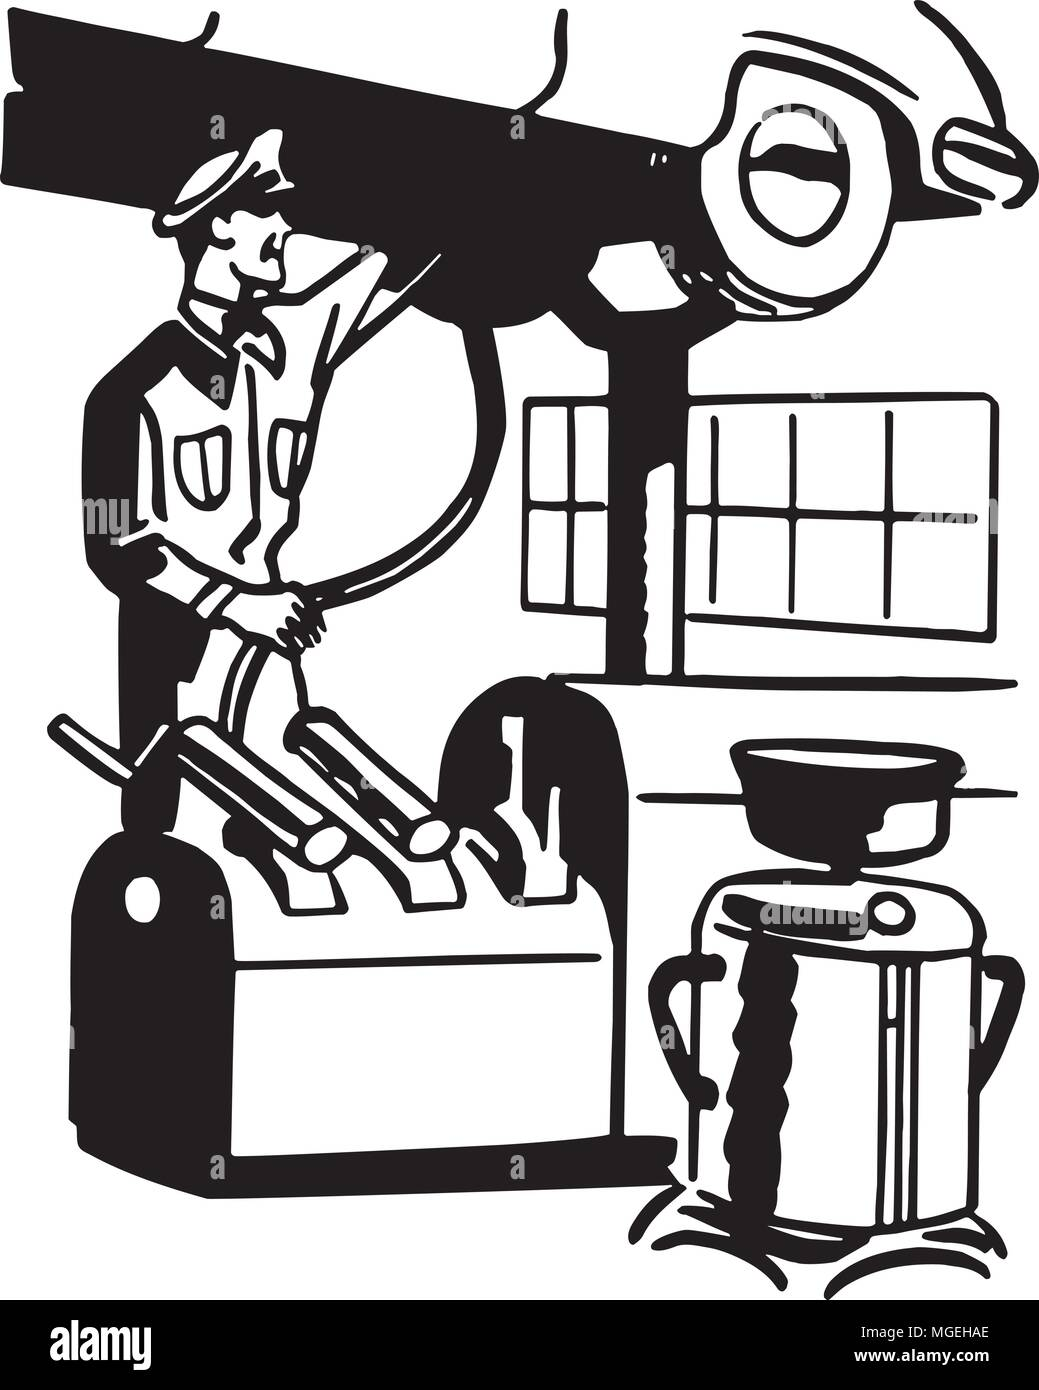 Servicing Car - Retro Clipart Illustration - Stock Vector